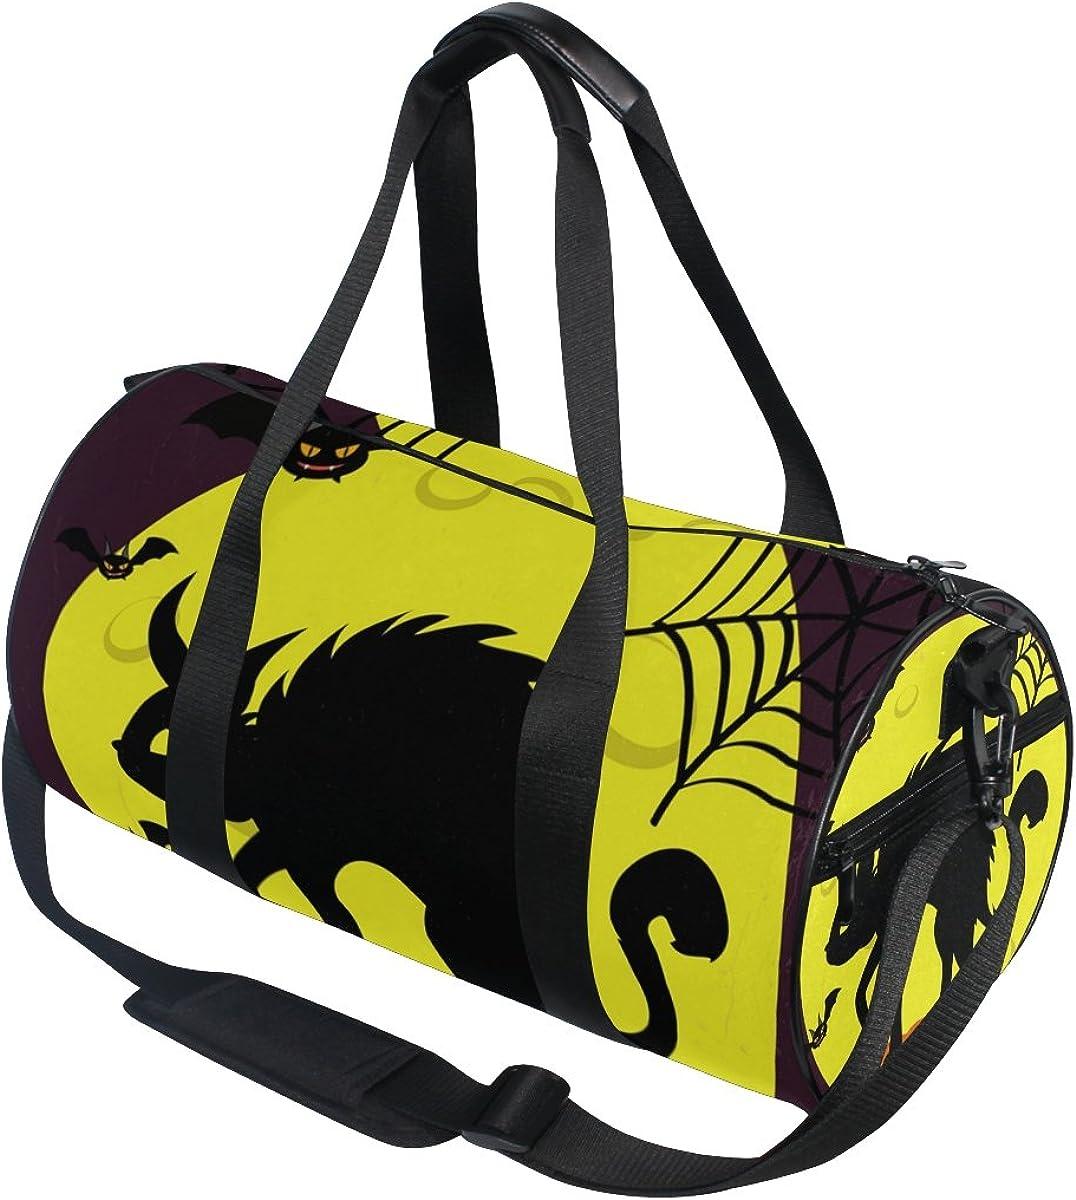 Evolutions Happy Halloween Black Cat Bat Travel Duffel Bag Sports Gym Bag For Men /& Women